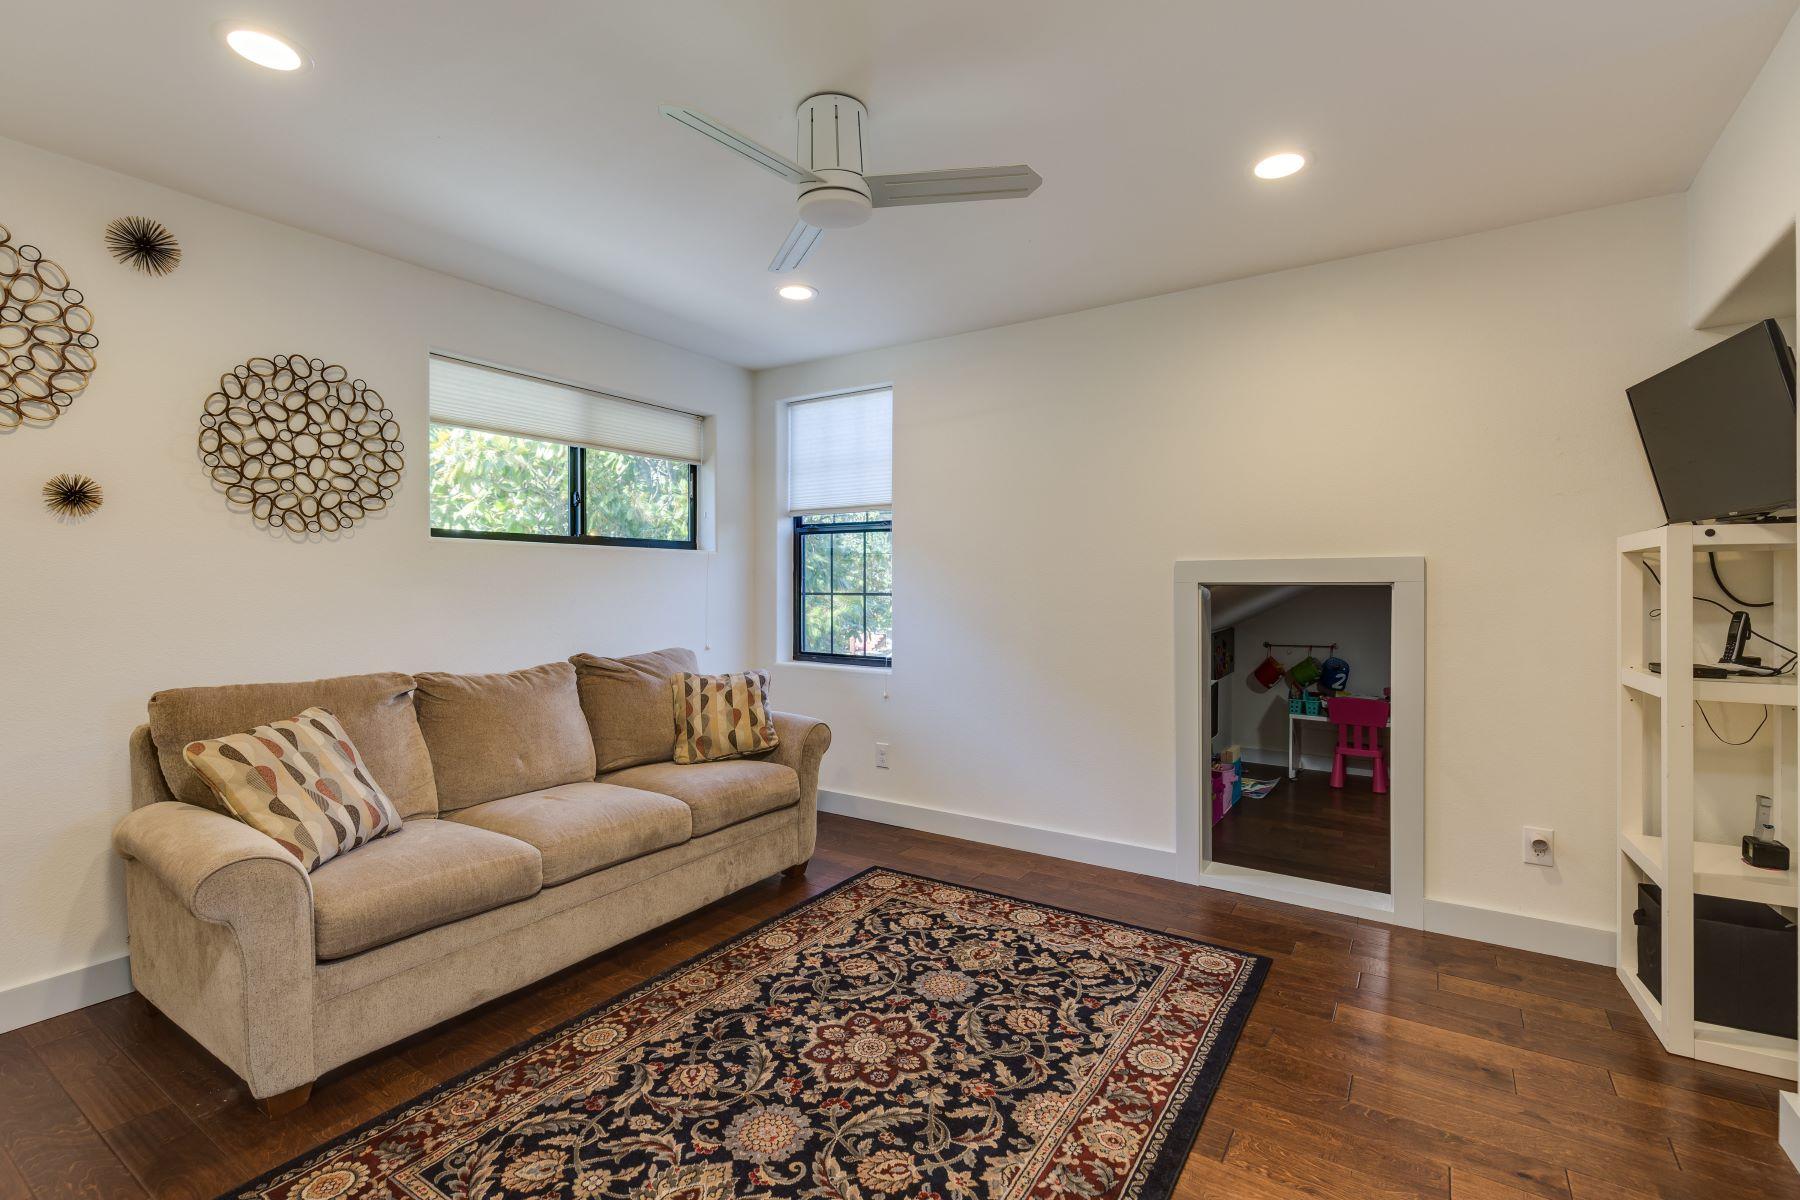 Additional photo for property listing at Spacious Home in Alamo Heights 312 Argo Avenue San Antonio, Texas 78209 Estados Unidos